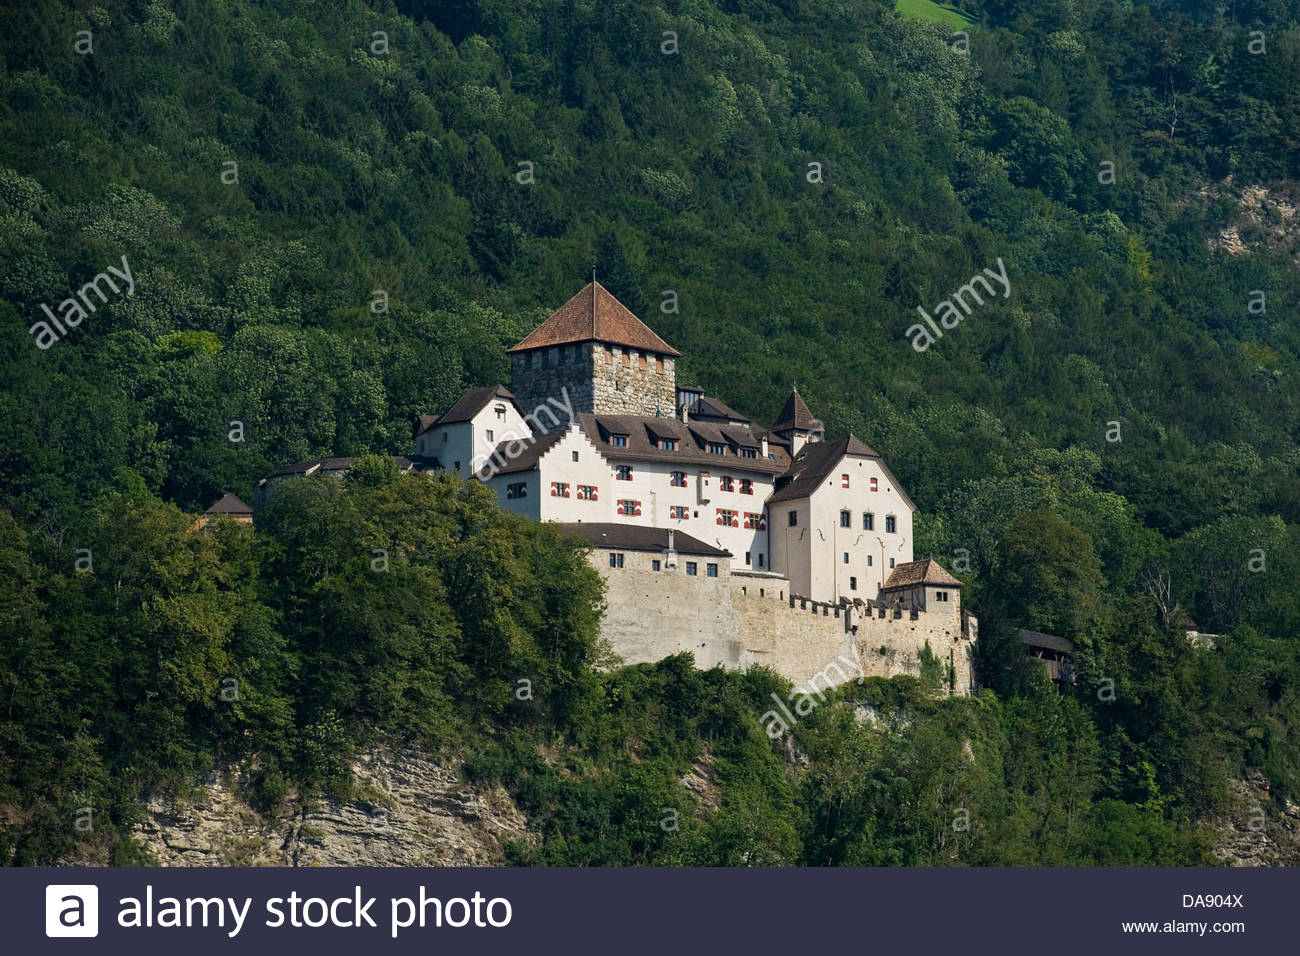 Liechtenstein,Vaduz,castle - Stock Image